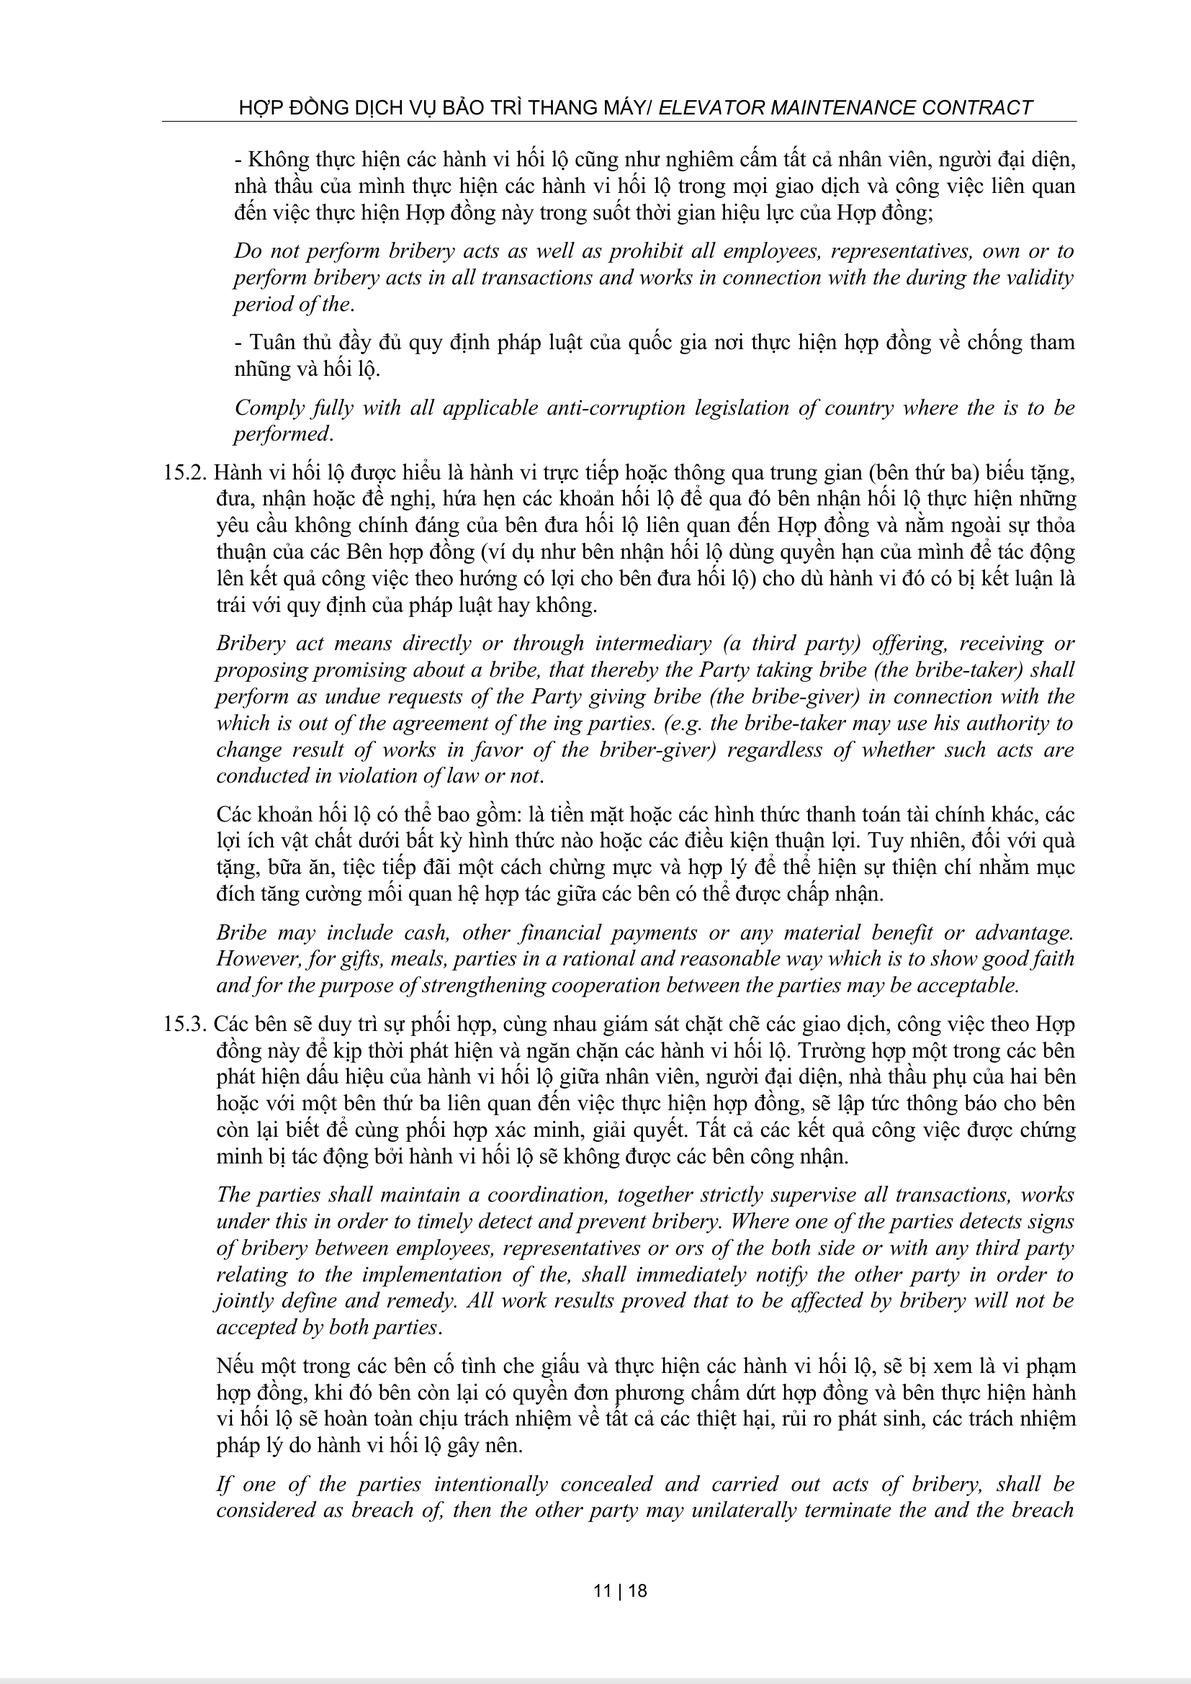 Maintenance Service Agreement-10